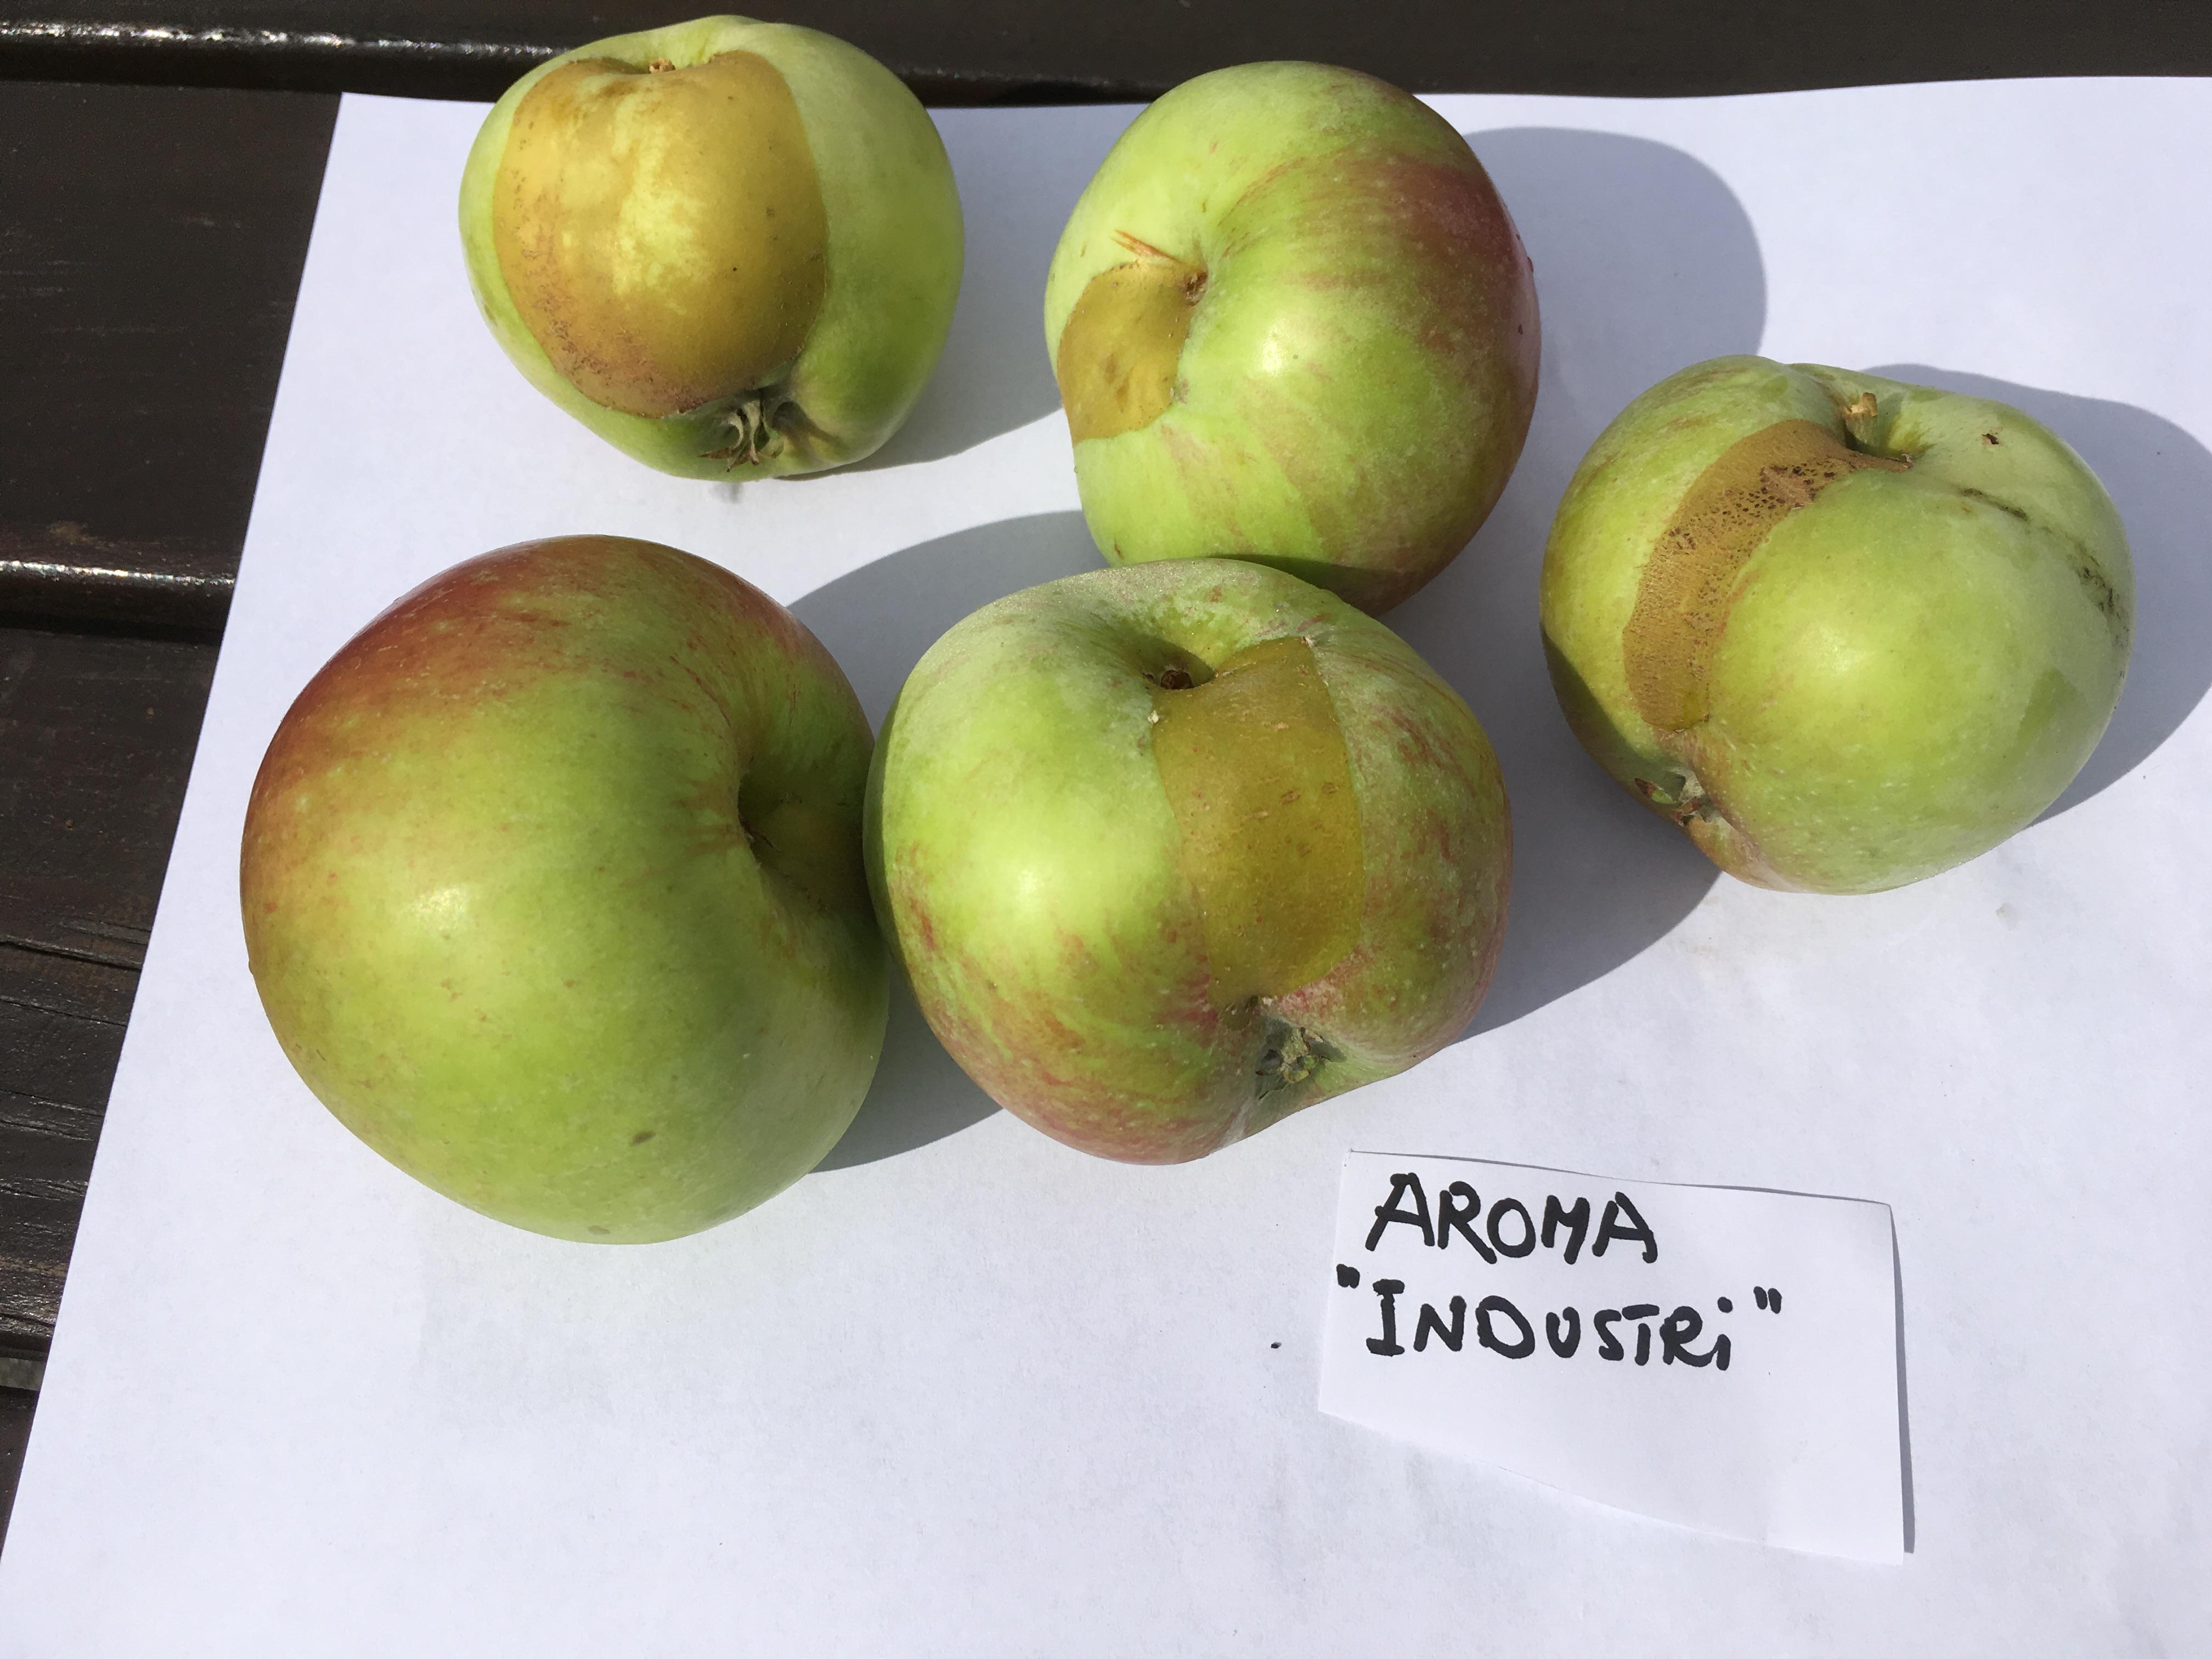 Frostskadat äpple med slips